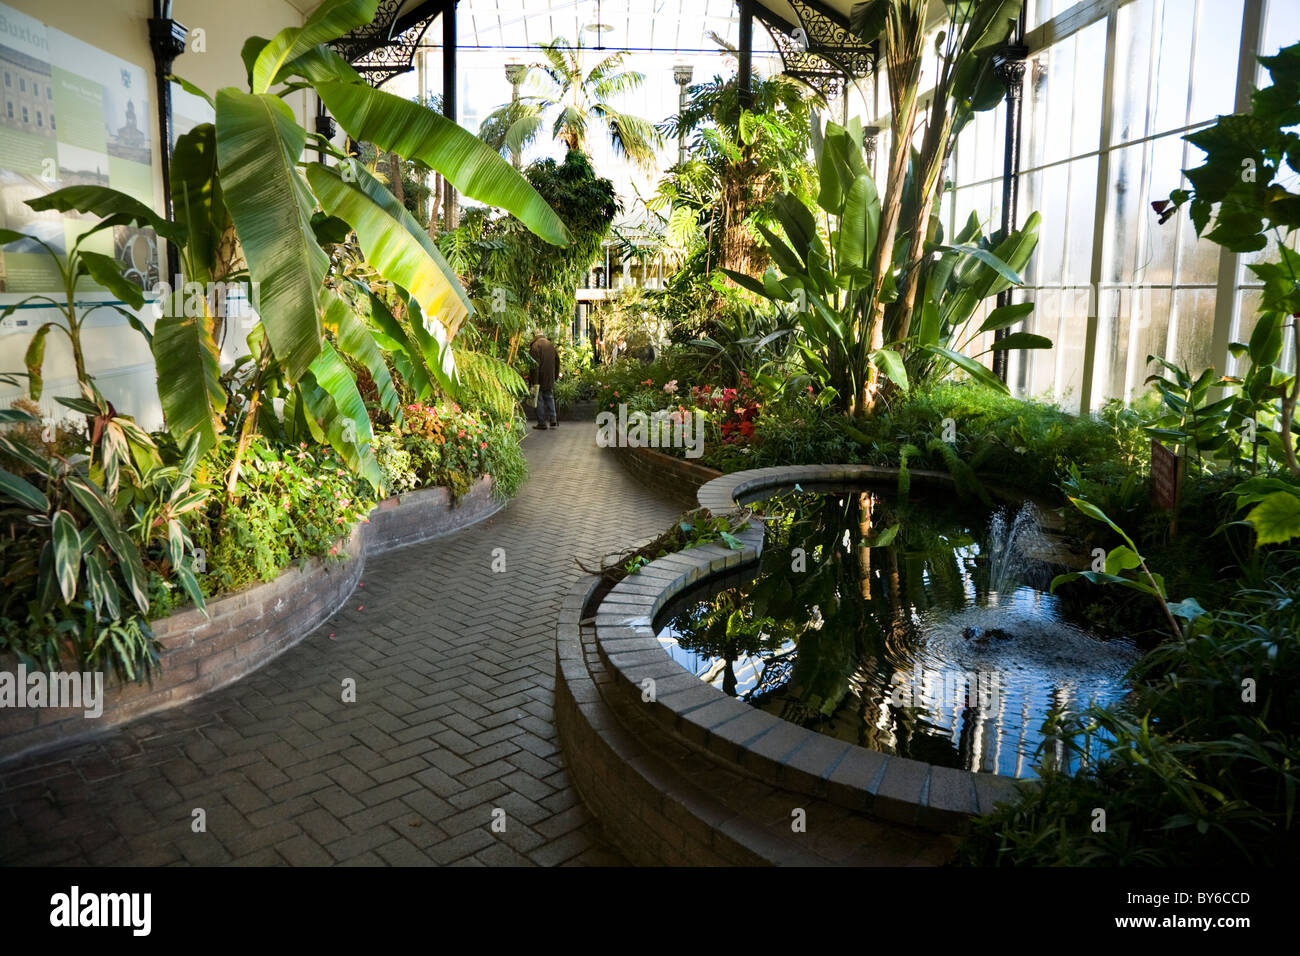 buxton pavillion gardens (botanical garden) tropical plants